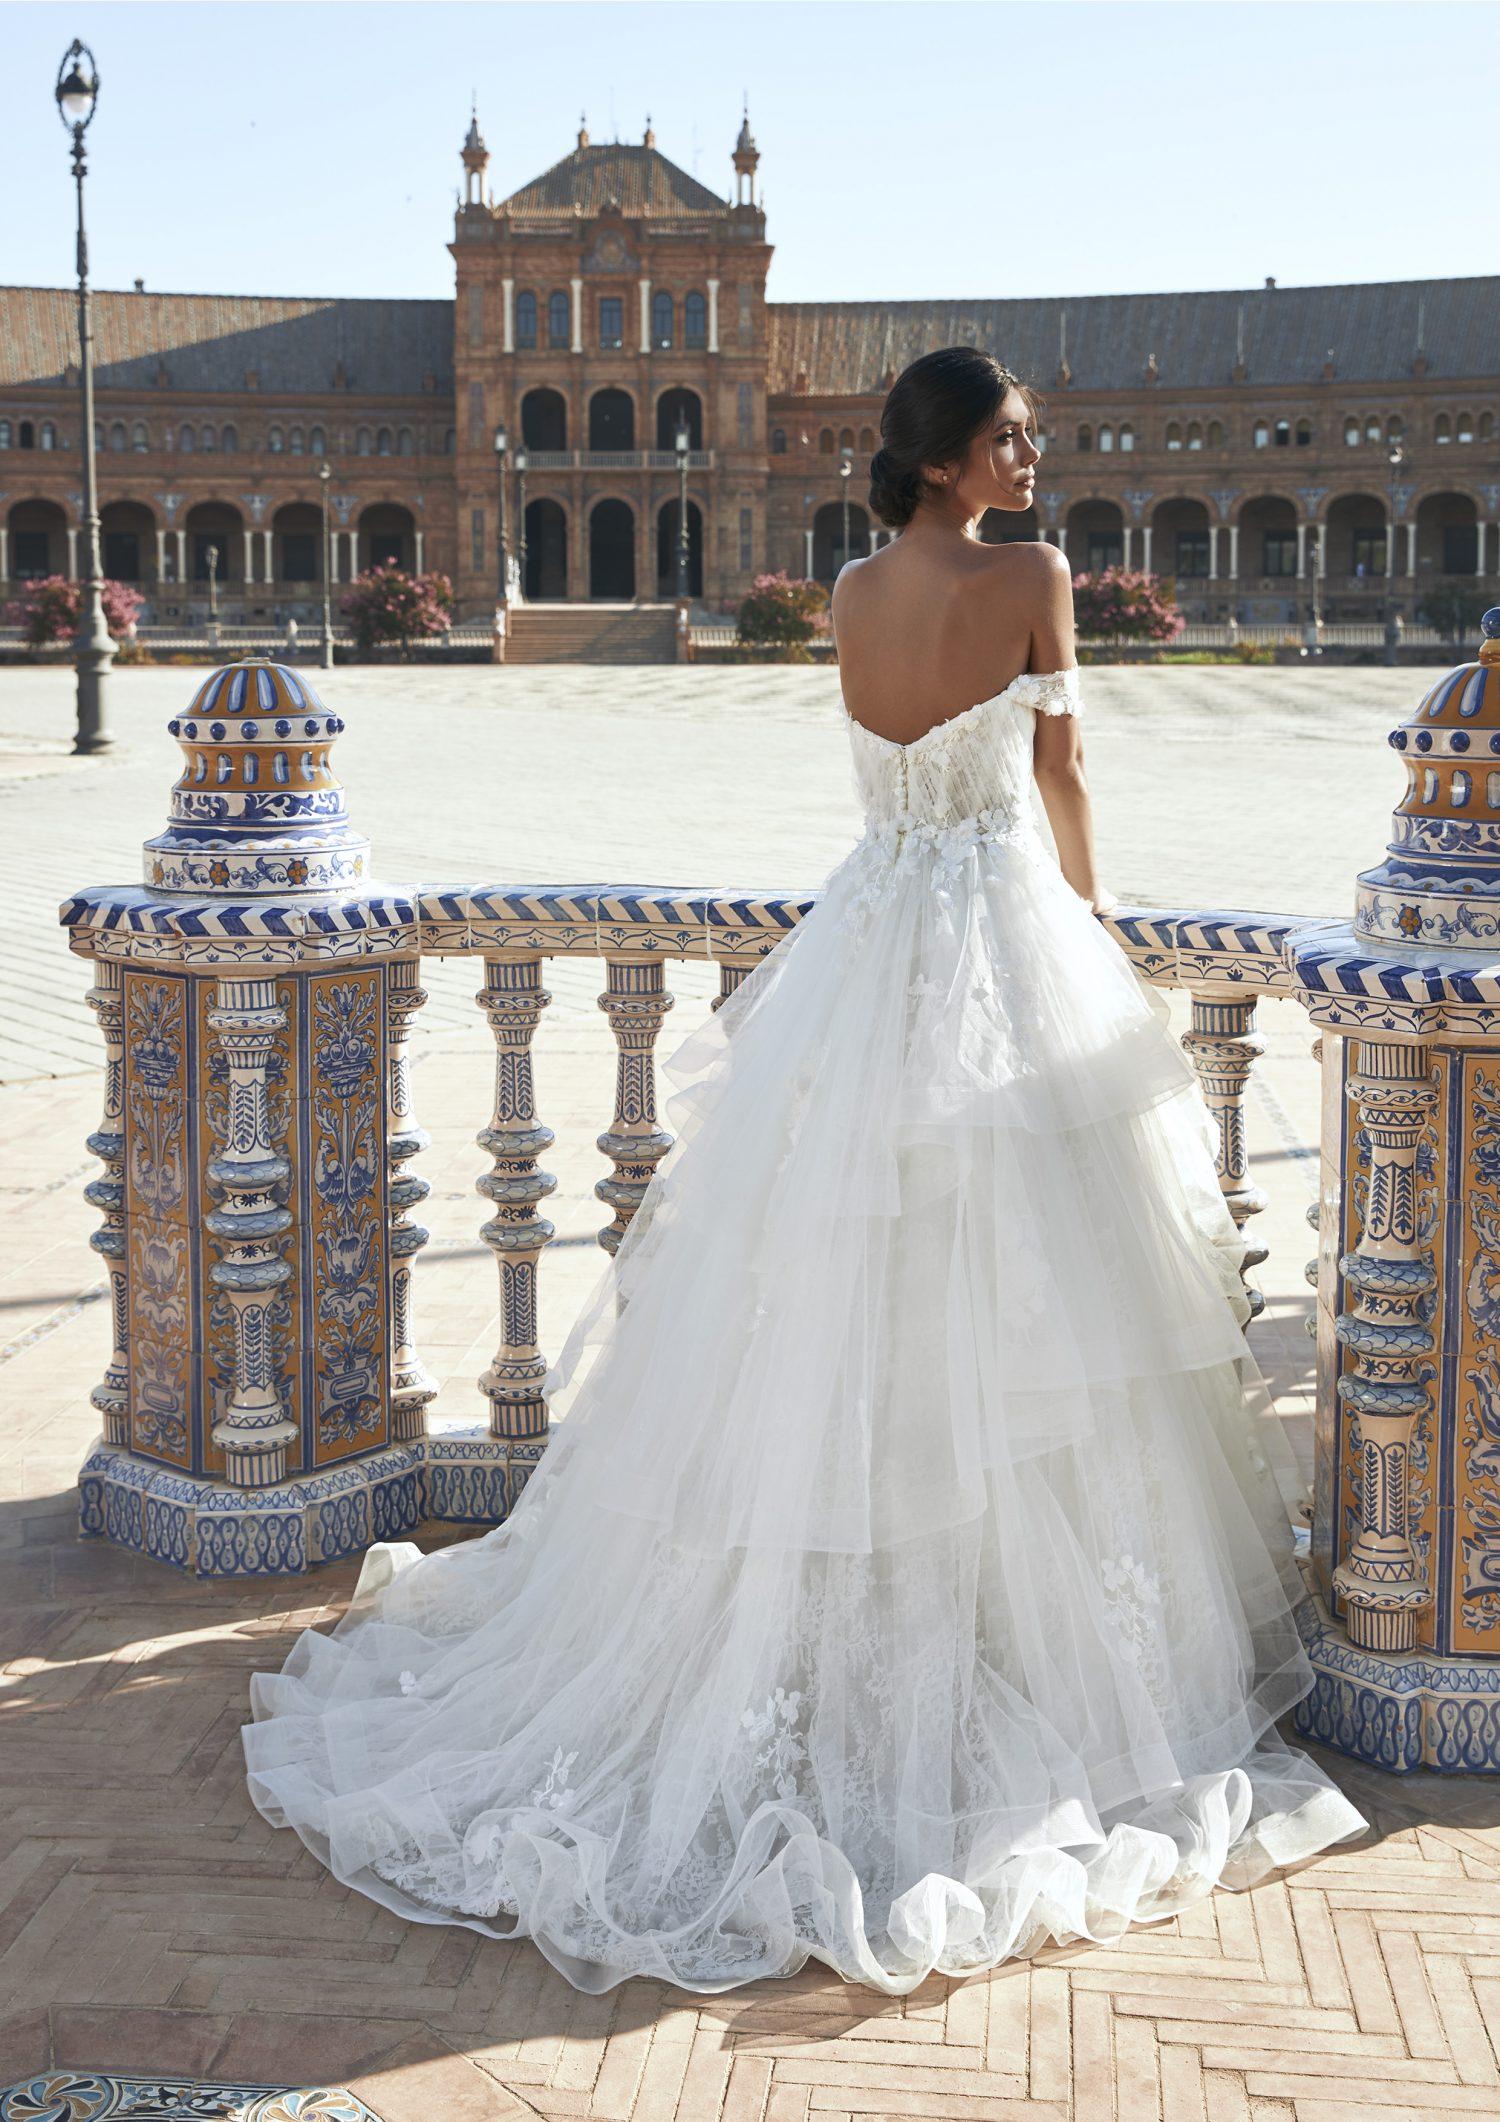 Pronovias vestidos de Novia 2021 Marchesa 27 - Marchesa la Nueva Colección de Vestidos de Novia Pronovias 2021